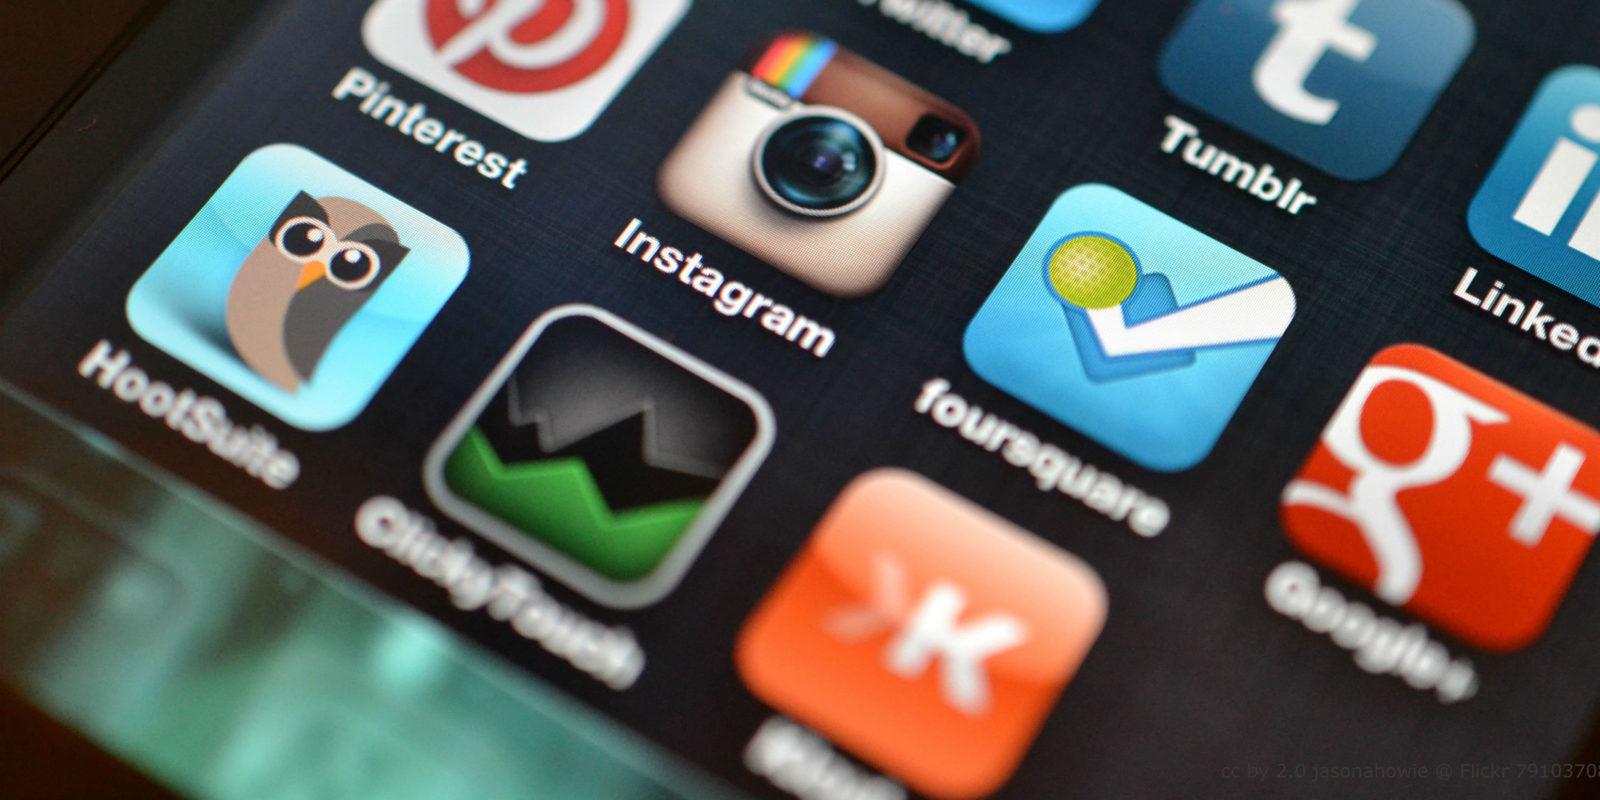 Identify the optimum schedules for each social media platform